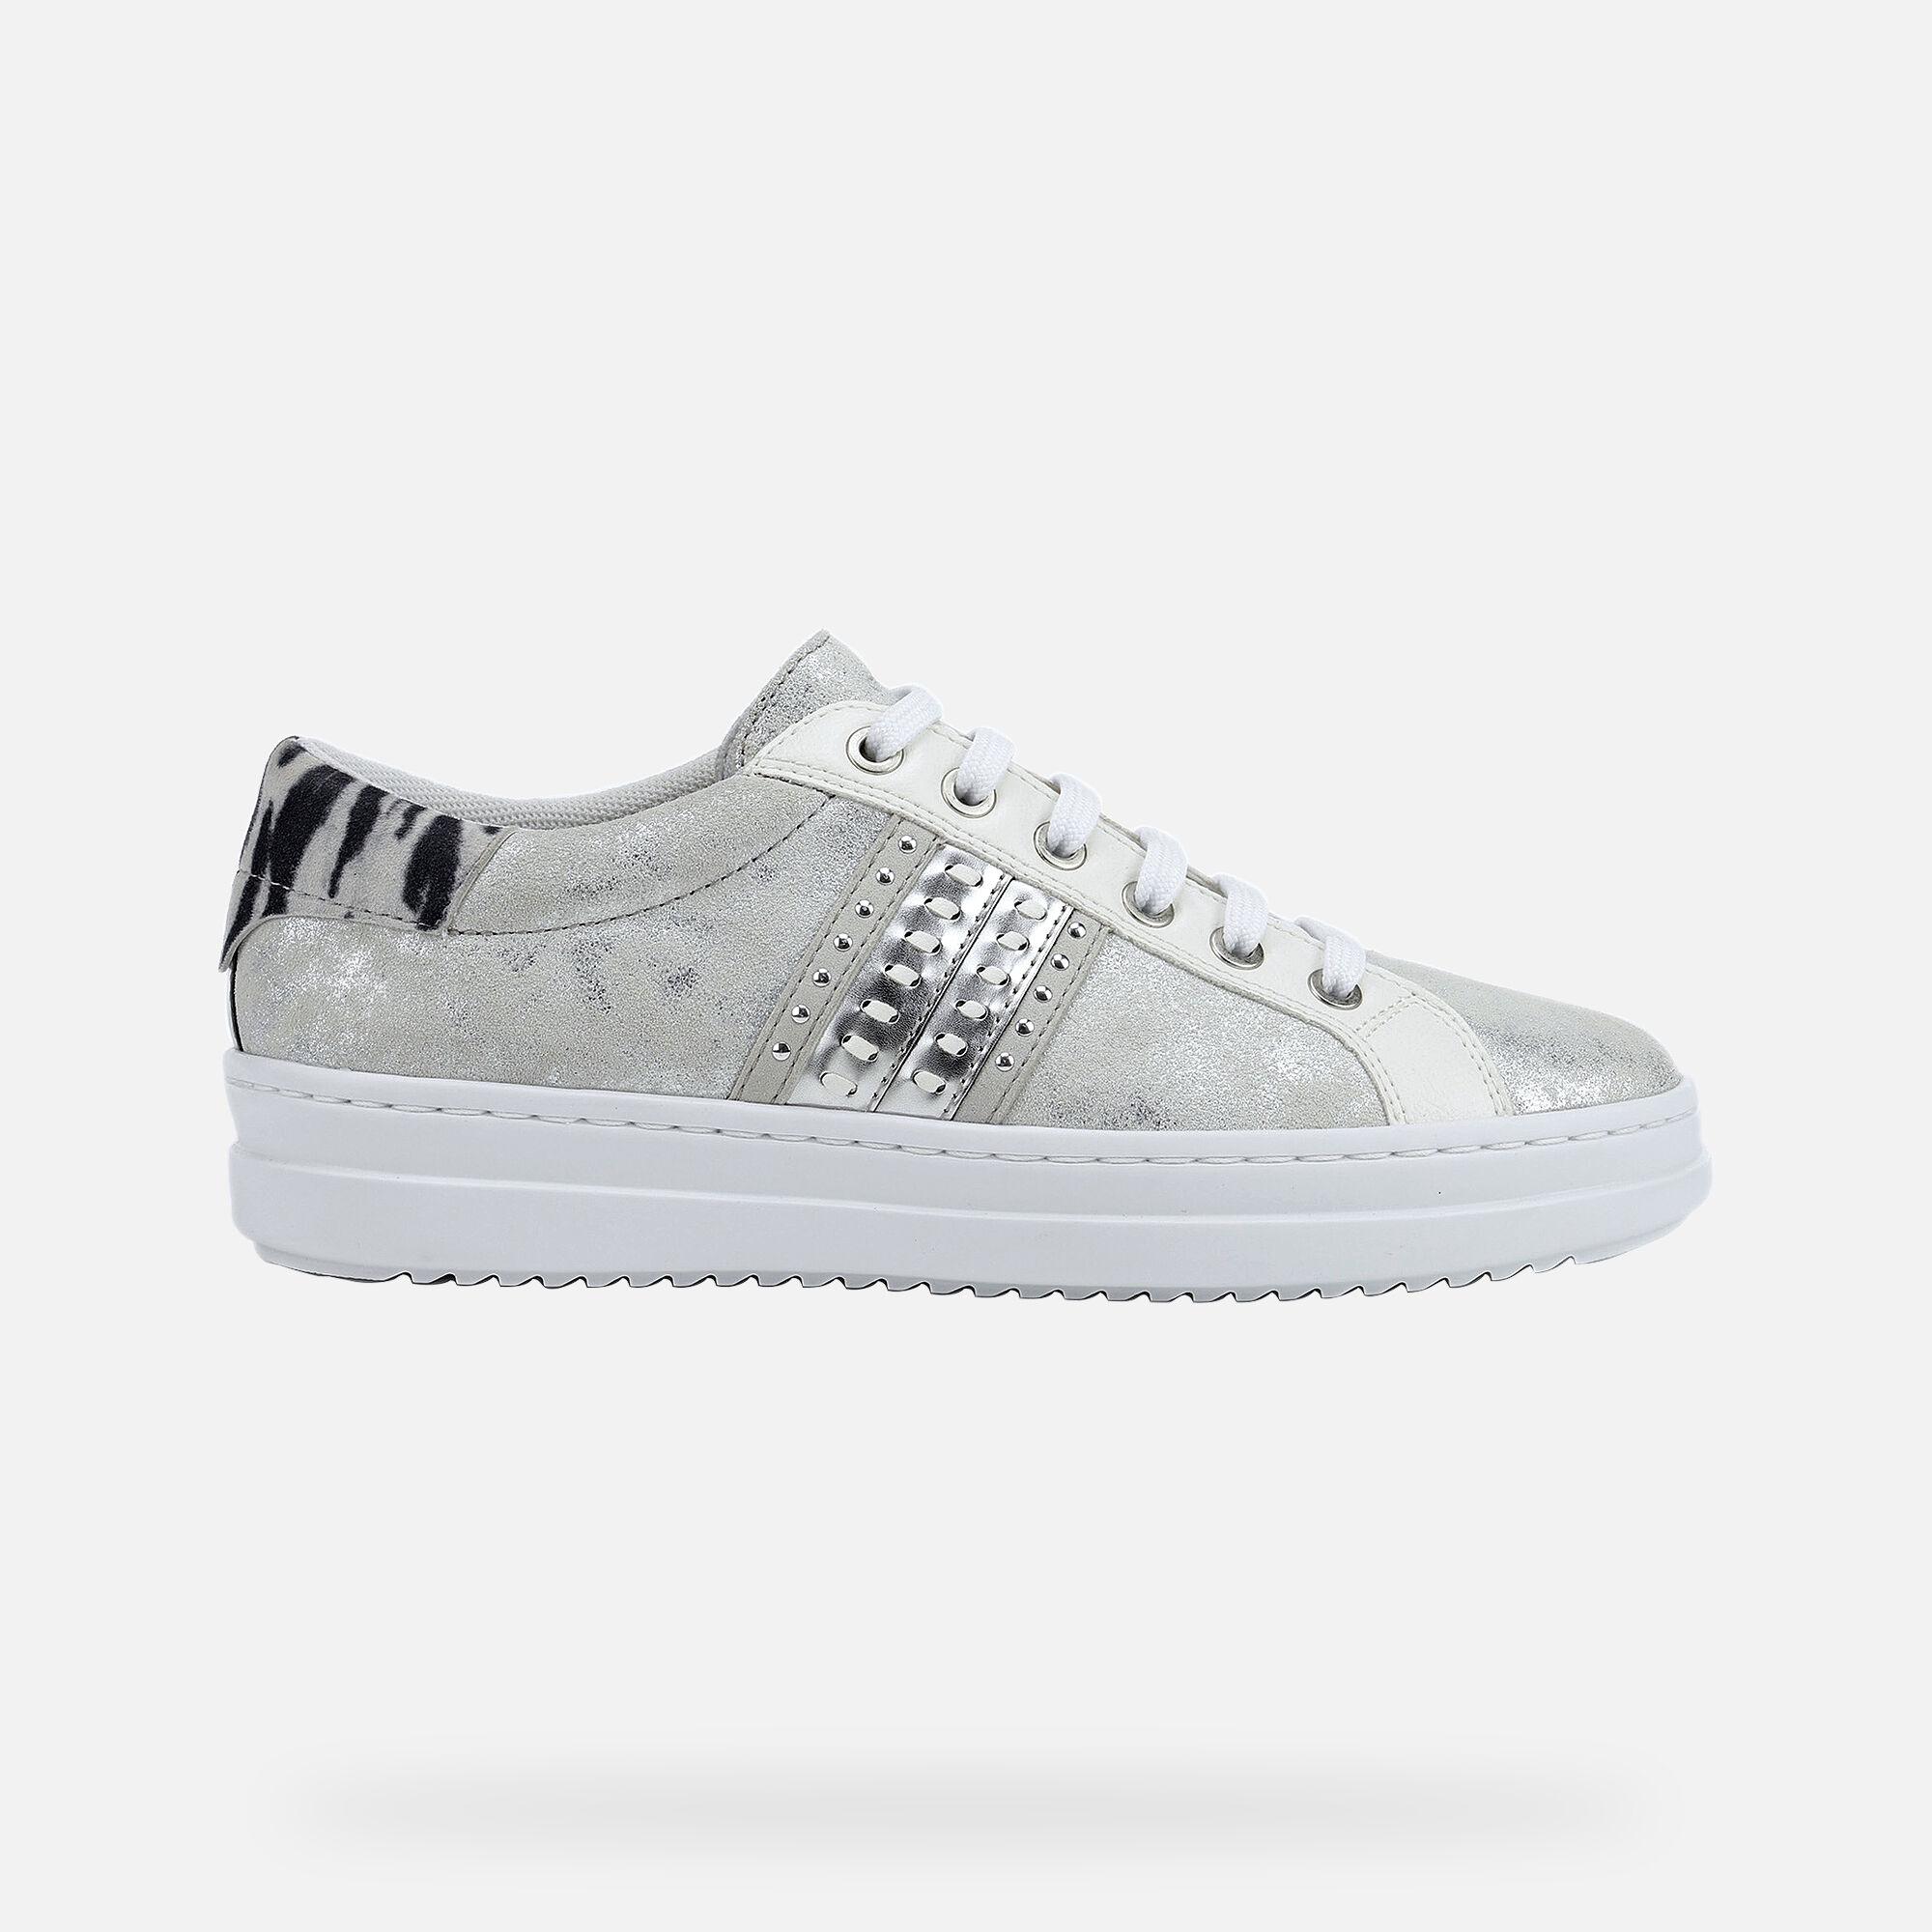 Geox PONTOISE Woman: Silver Sneakers